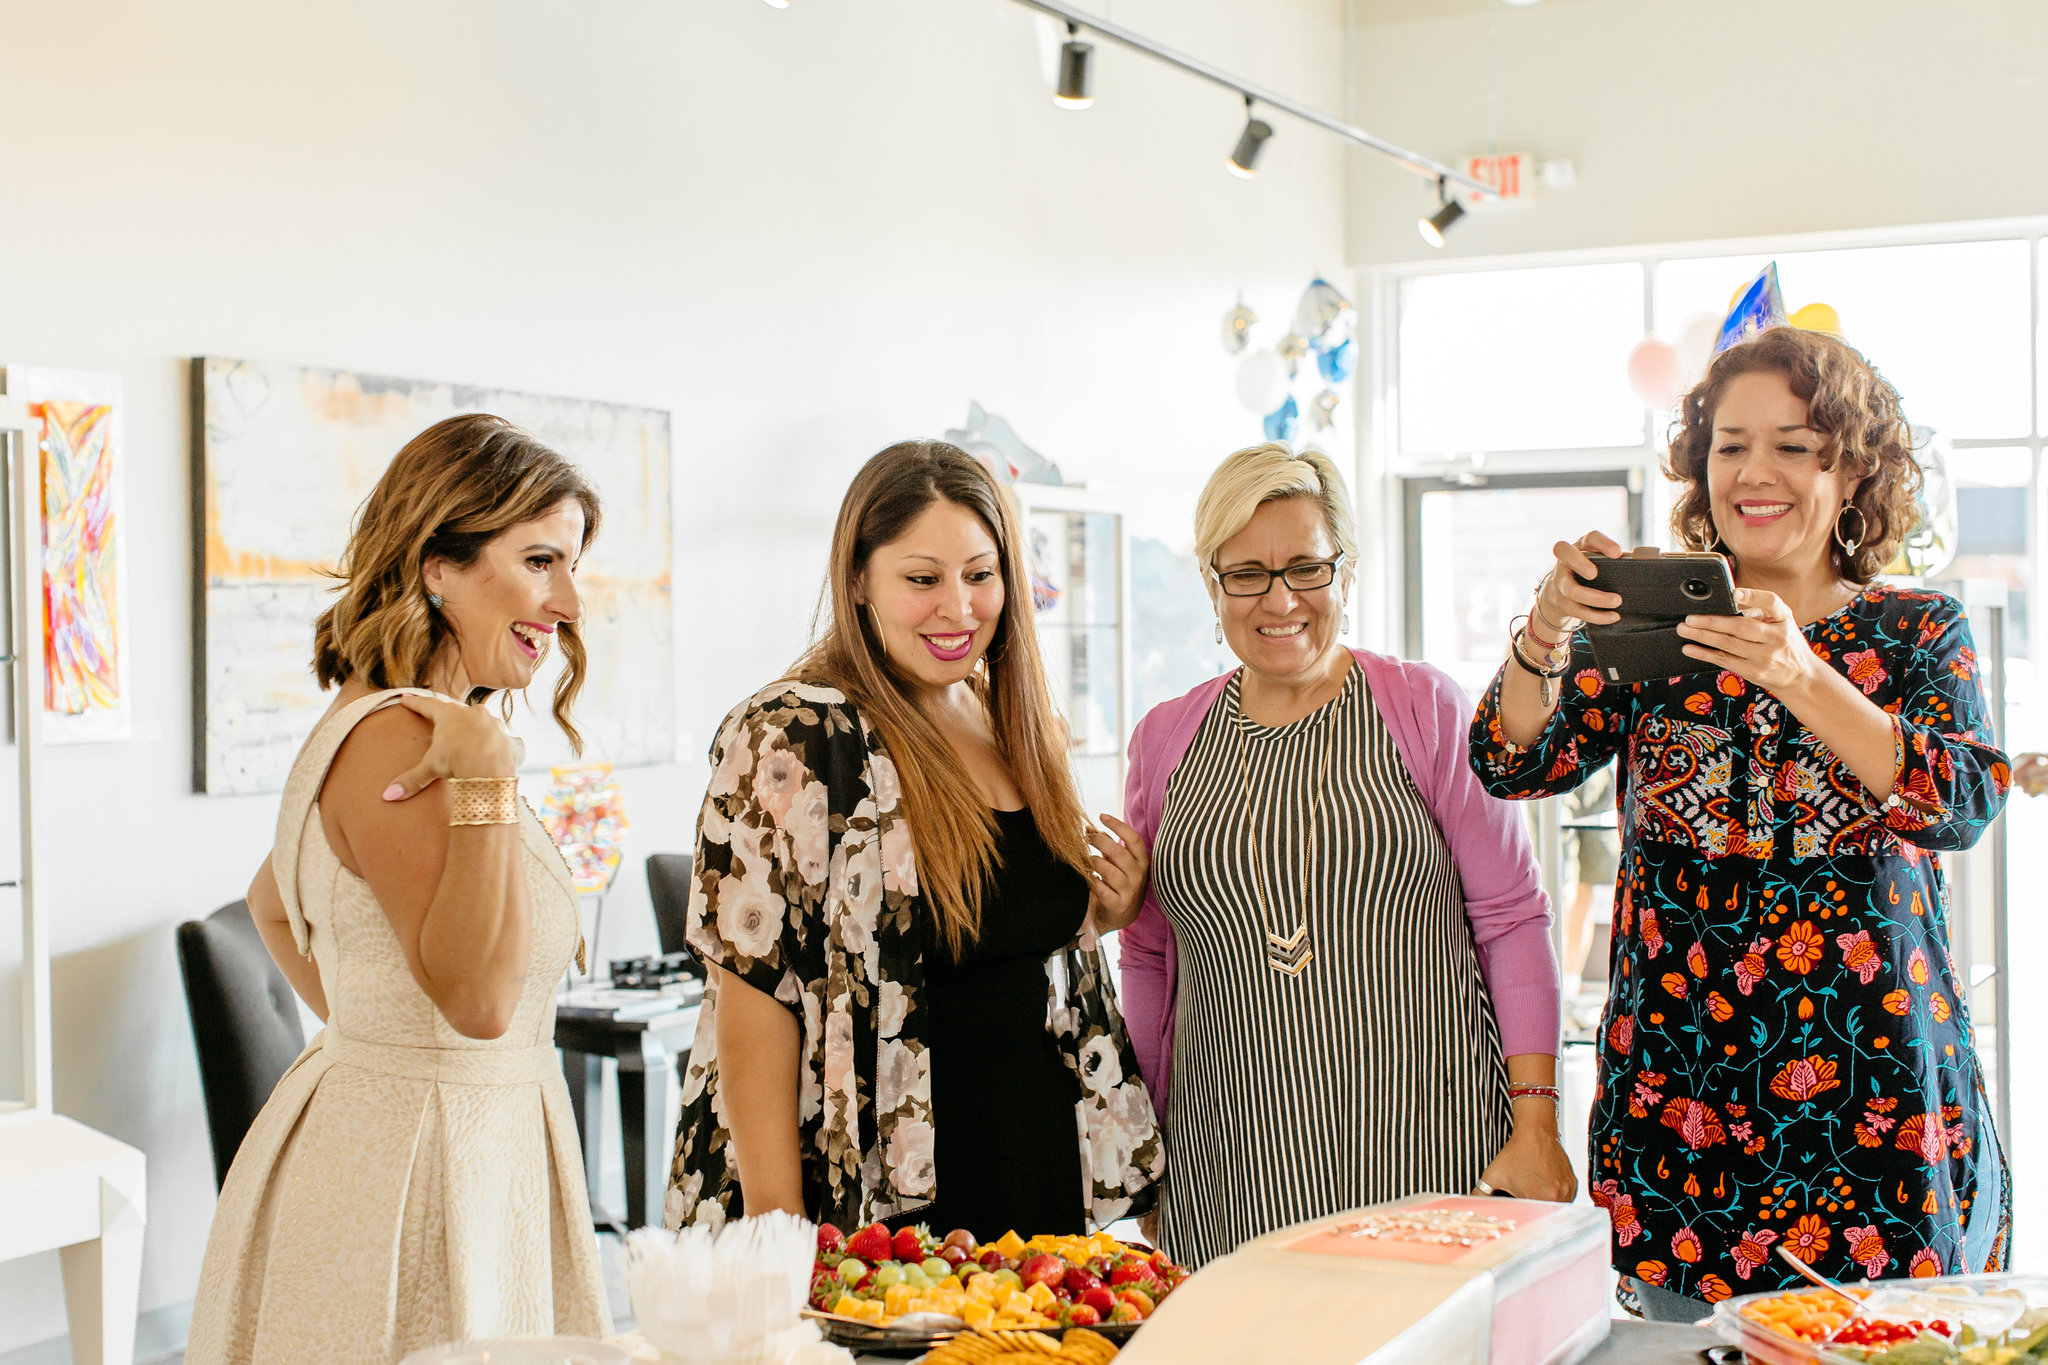 Alexa-Vossler-Photo_Dallas-Event-Photographer_Brite-Bar-Beauty-2018-Lipstick-Launch-Party-23.jpg